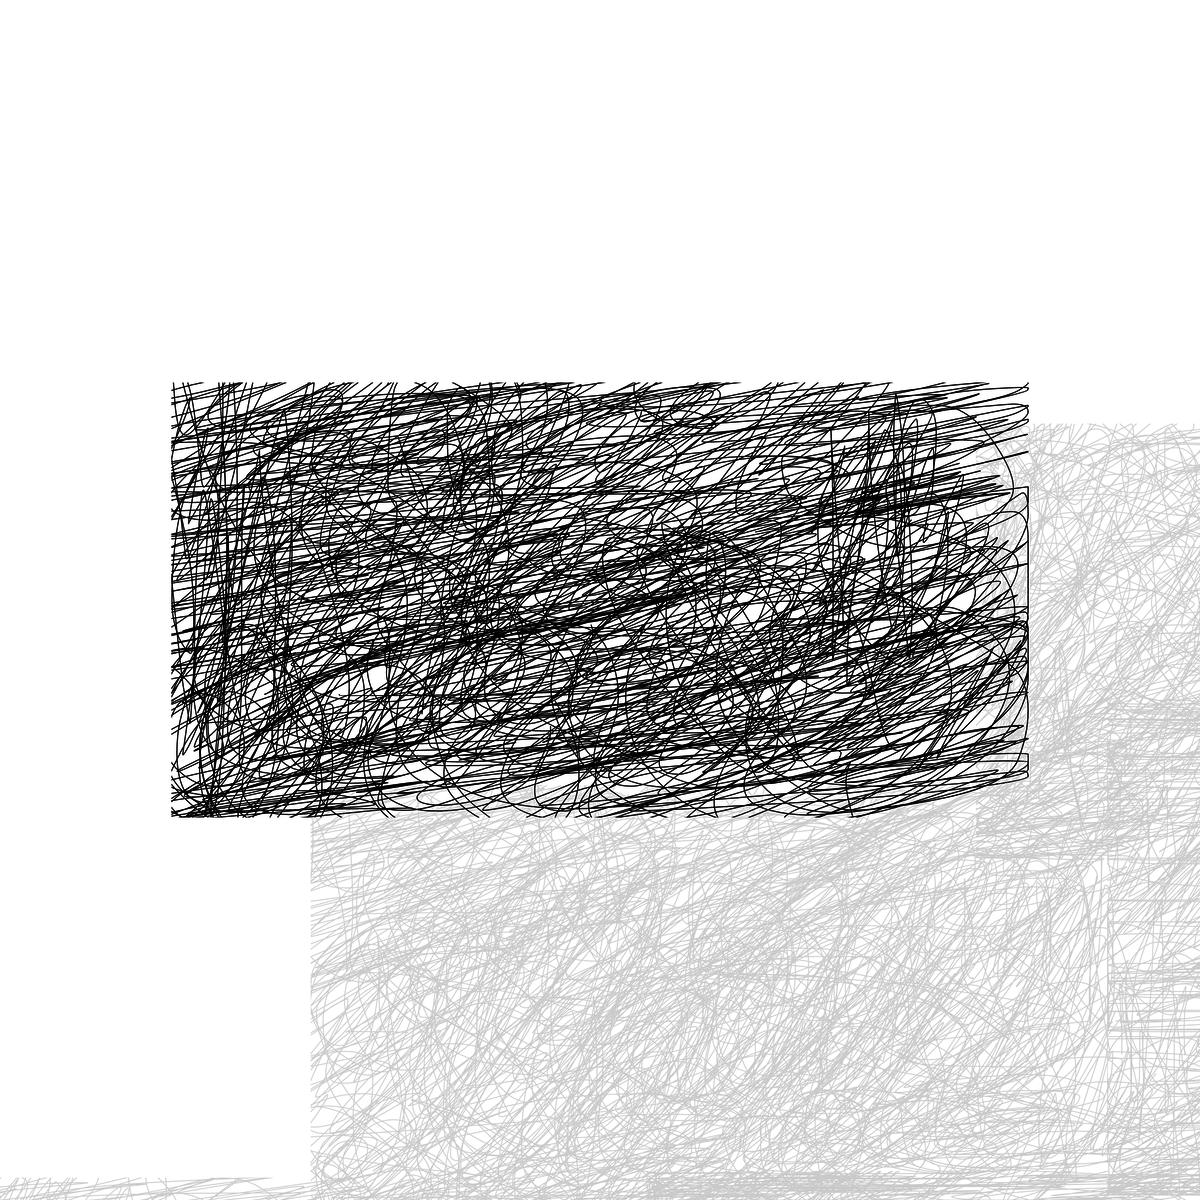 BAAAM drawing#23376 lat:46.5209999084472660lng: 6.6338219642639160